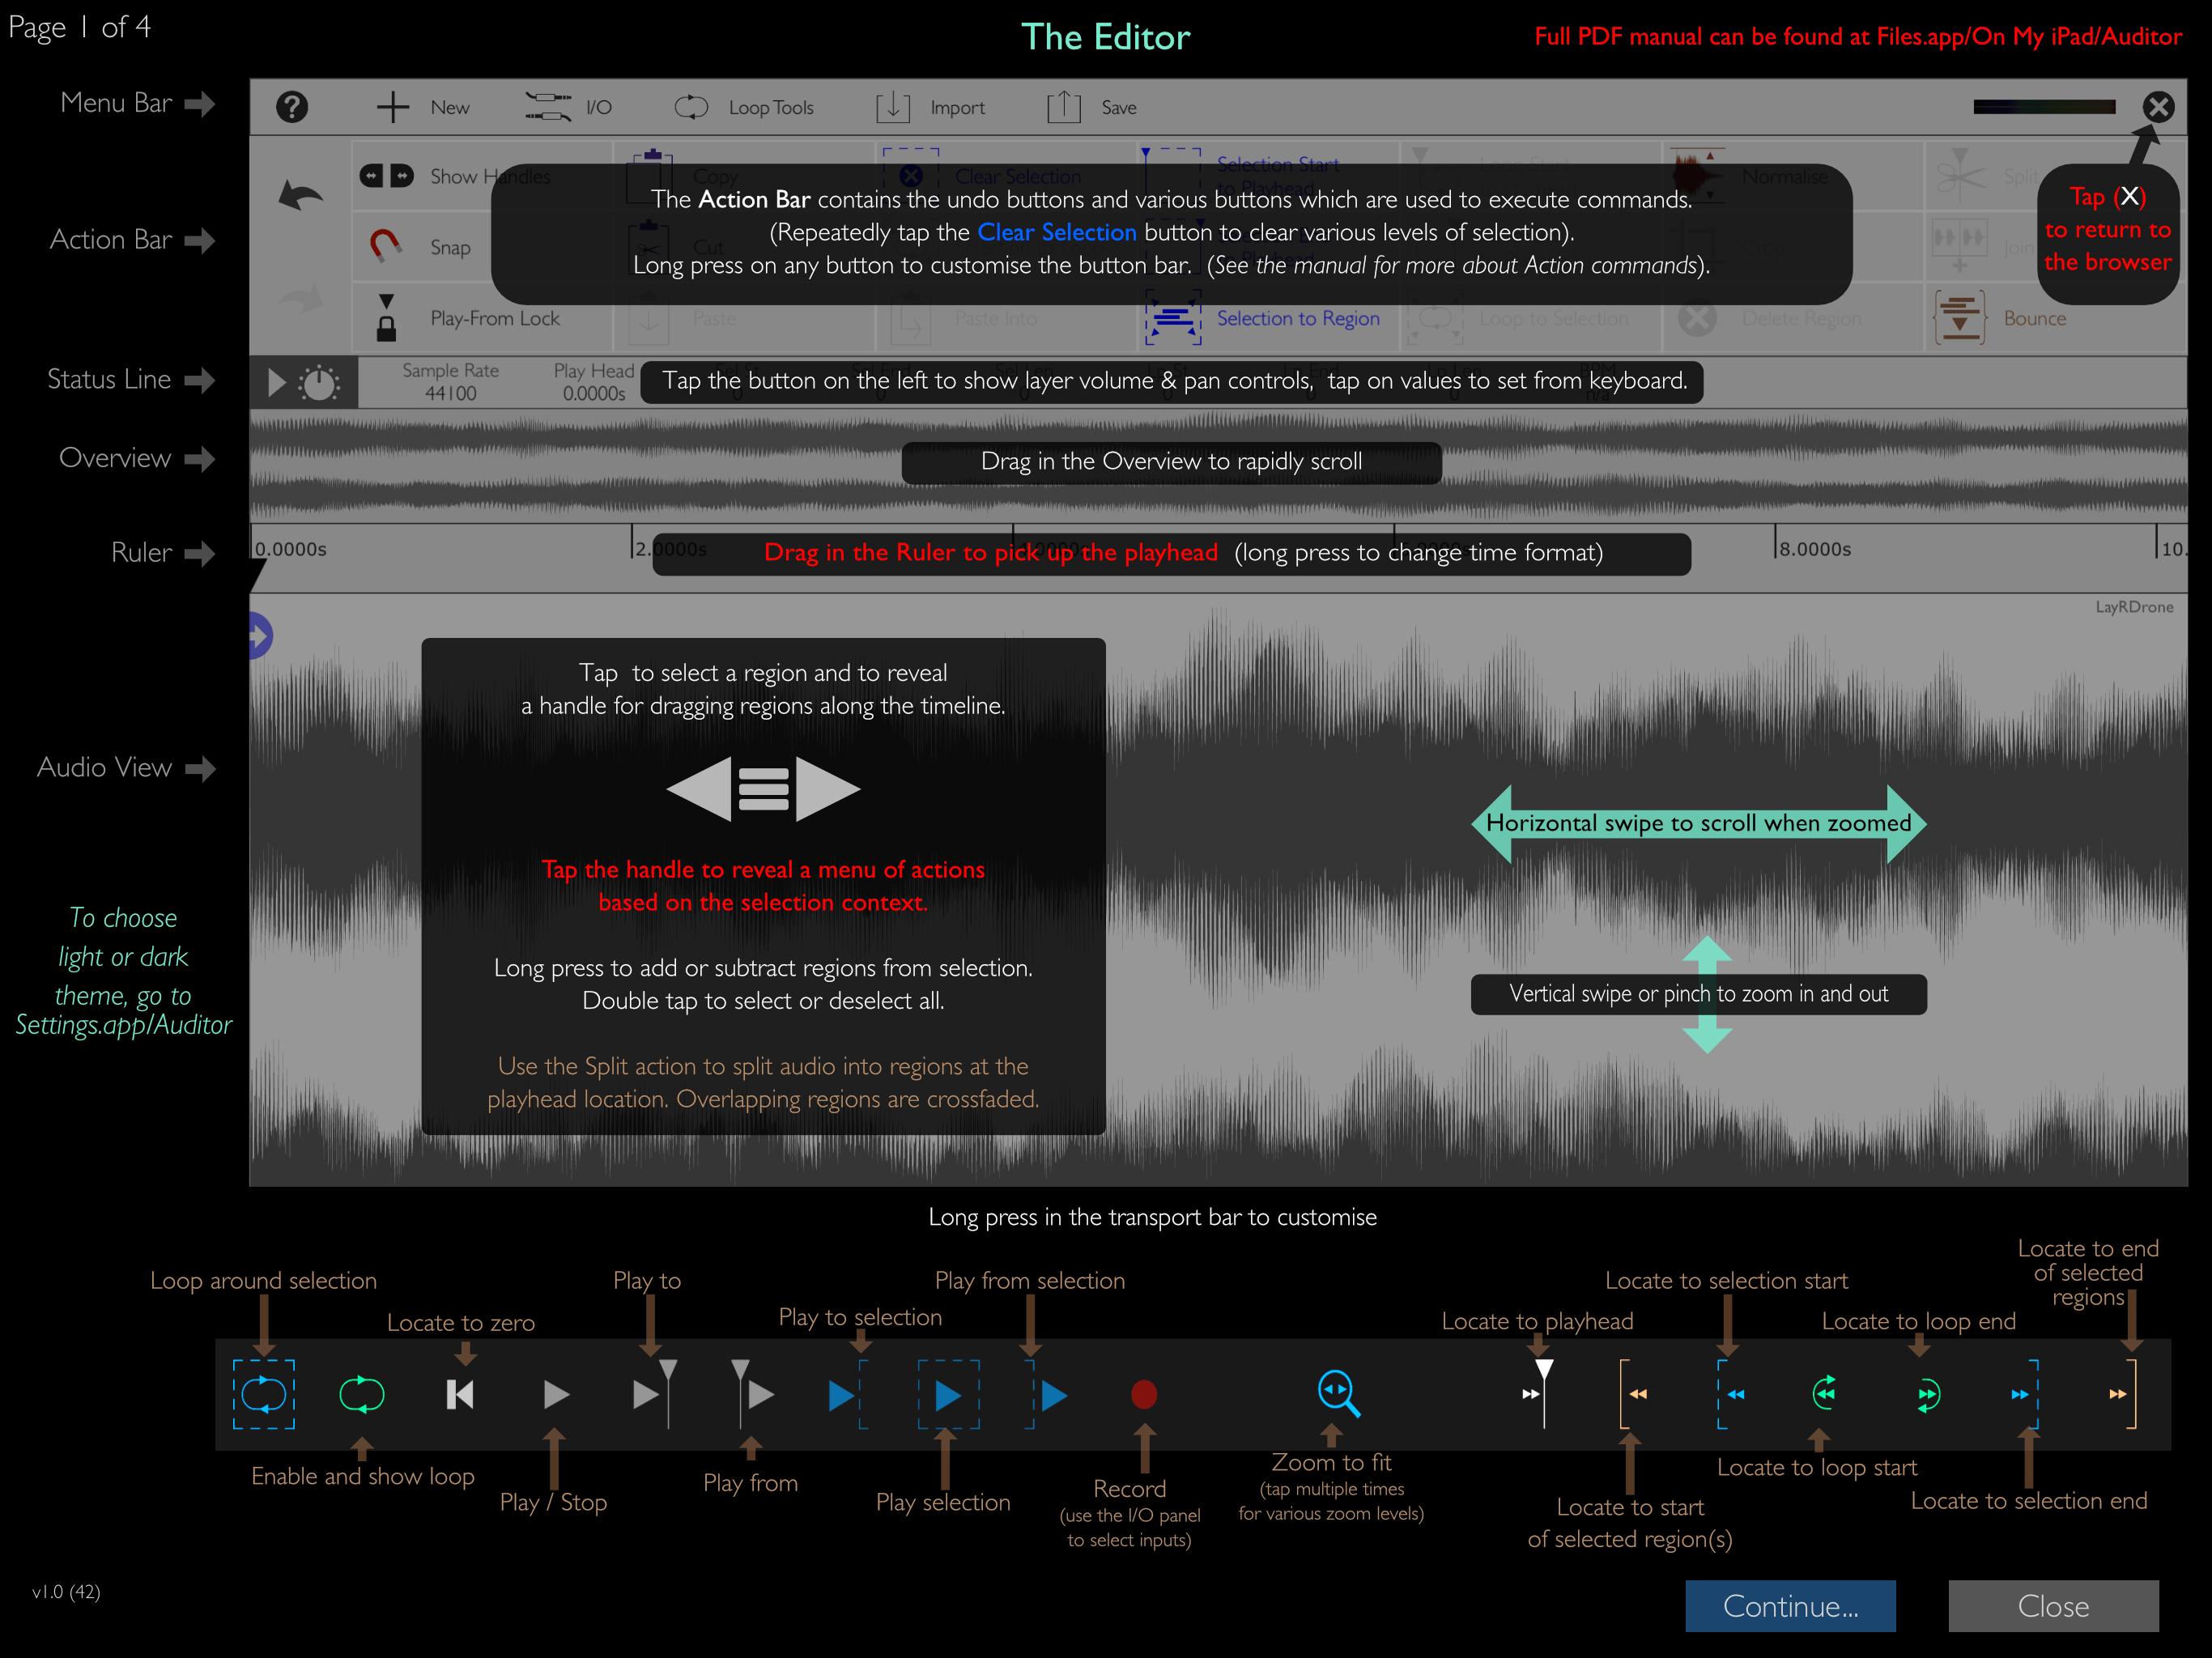 Auditor Full Onscreen Help